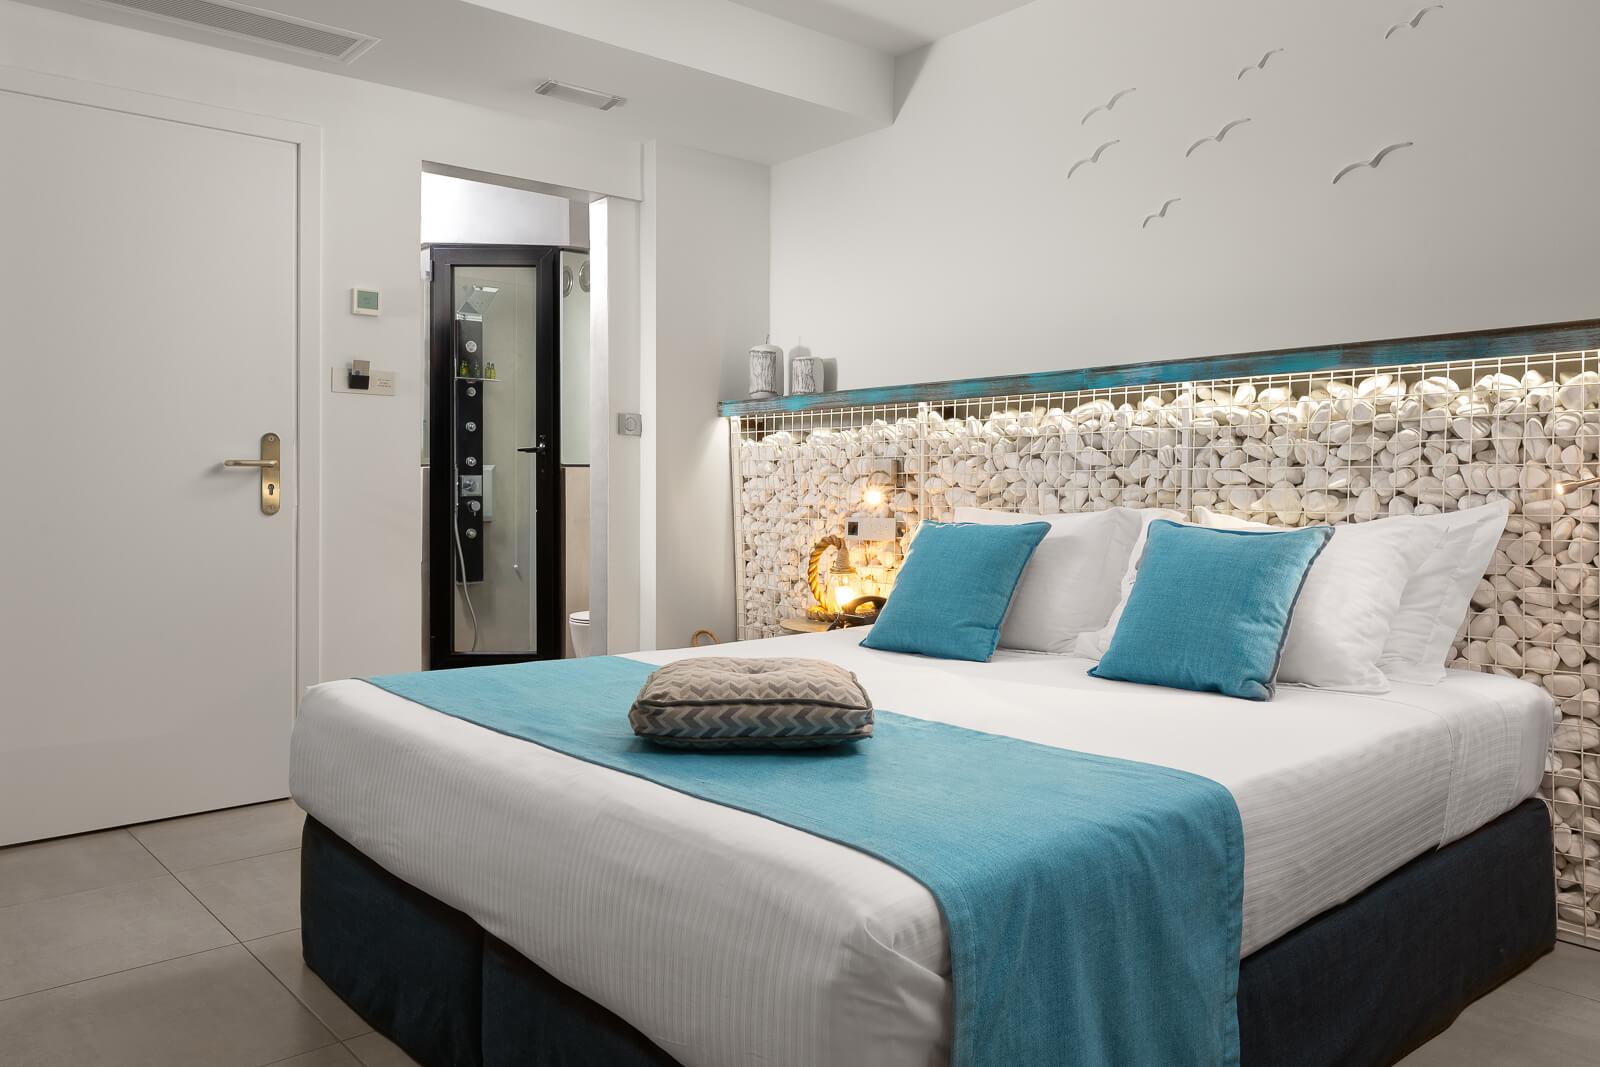 Faros Room - Elakati Hotel in Rhodes Greece